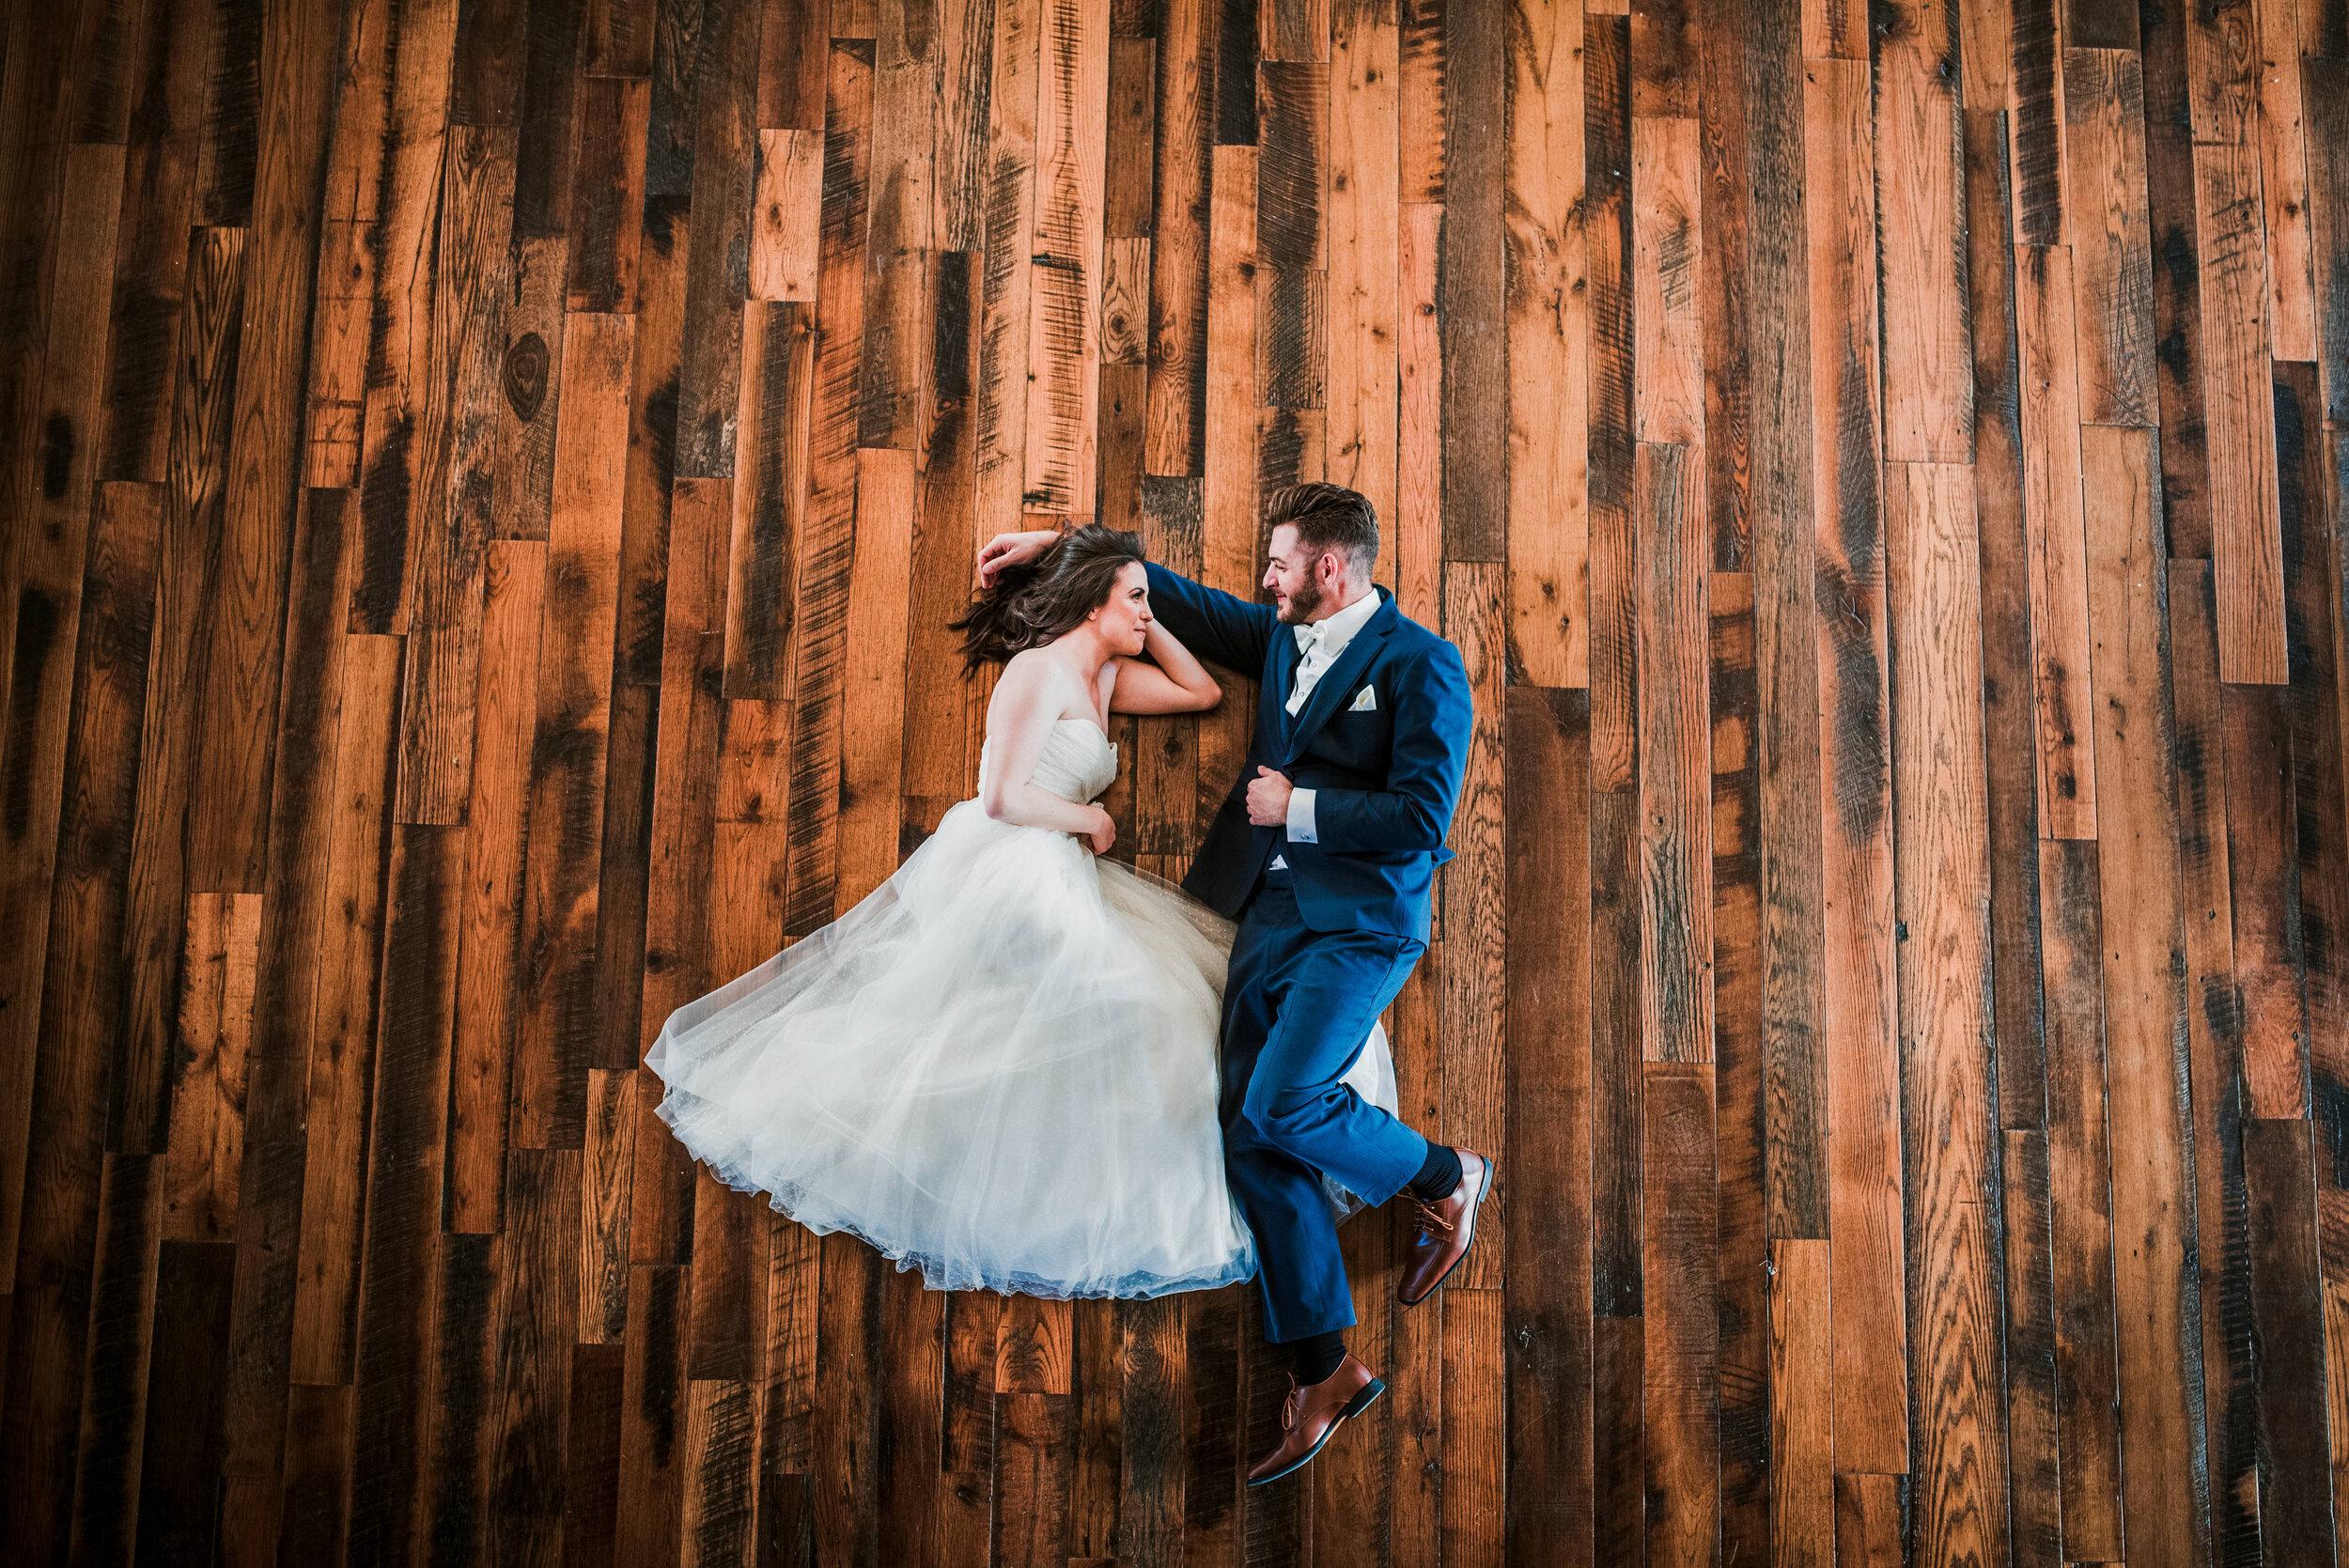 John Myers Nashville Wedding Photography Videography